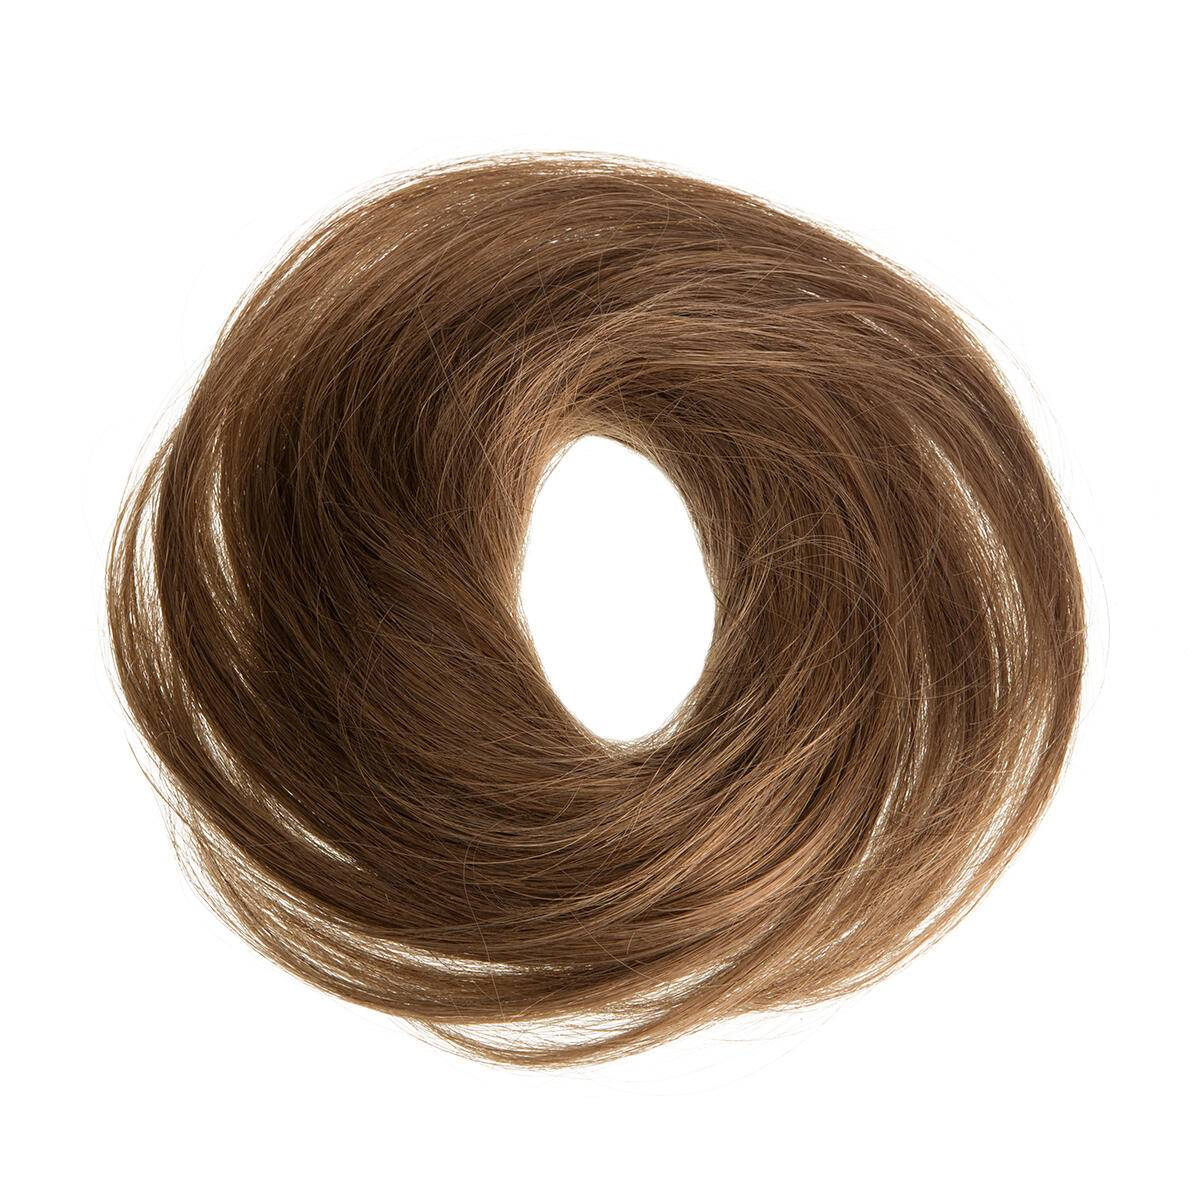 Image of Rapunzel® Aidot hiustenpidennykset Hair Scrunchie Original 20 g 5.1 Medium Ash Brown 0 cm